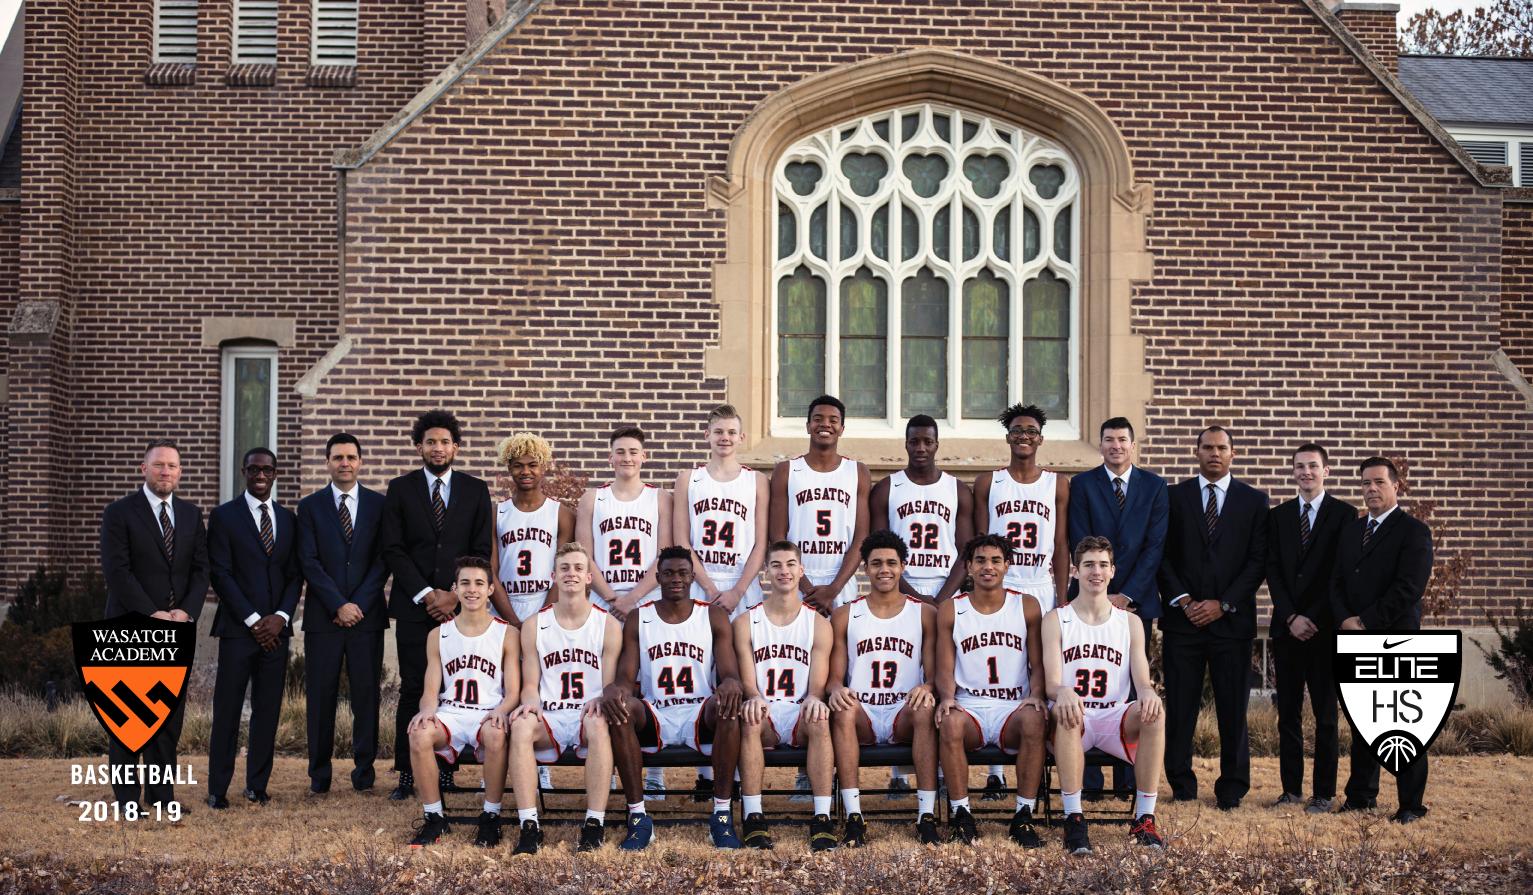 2018-19-Wasatch-Academy-Varsity-Basketball-(Web).png